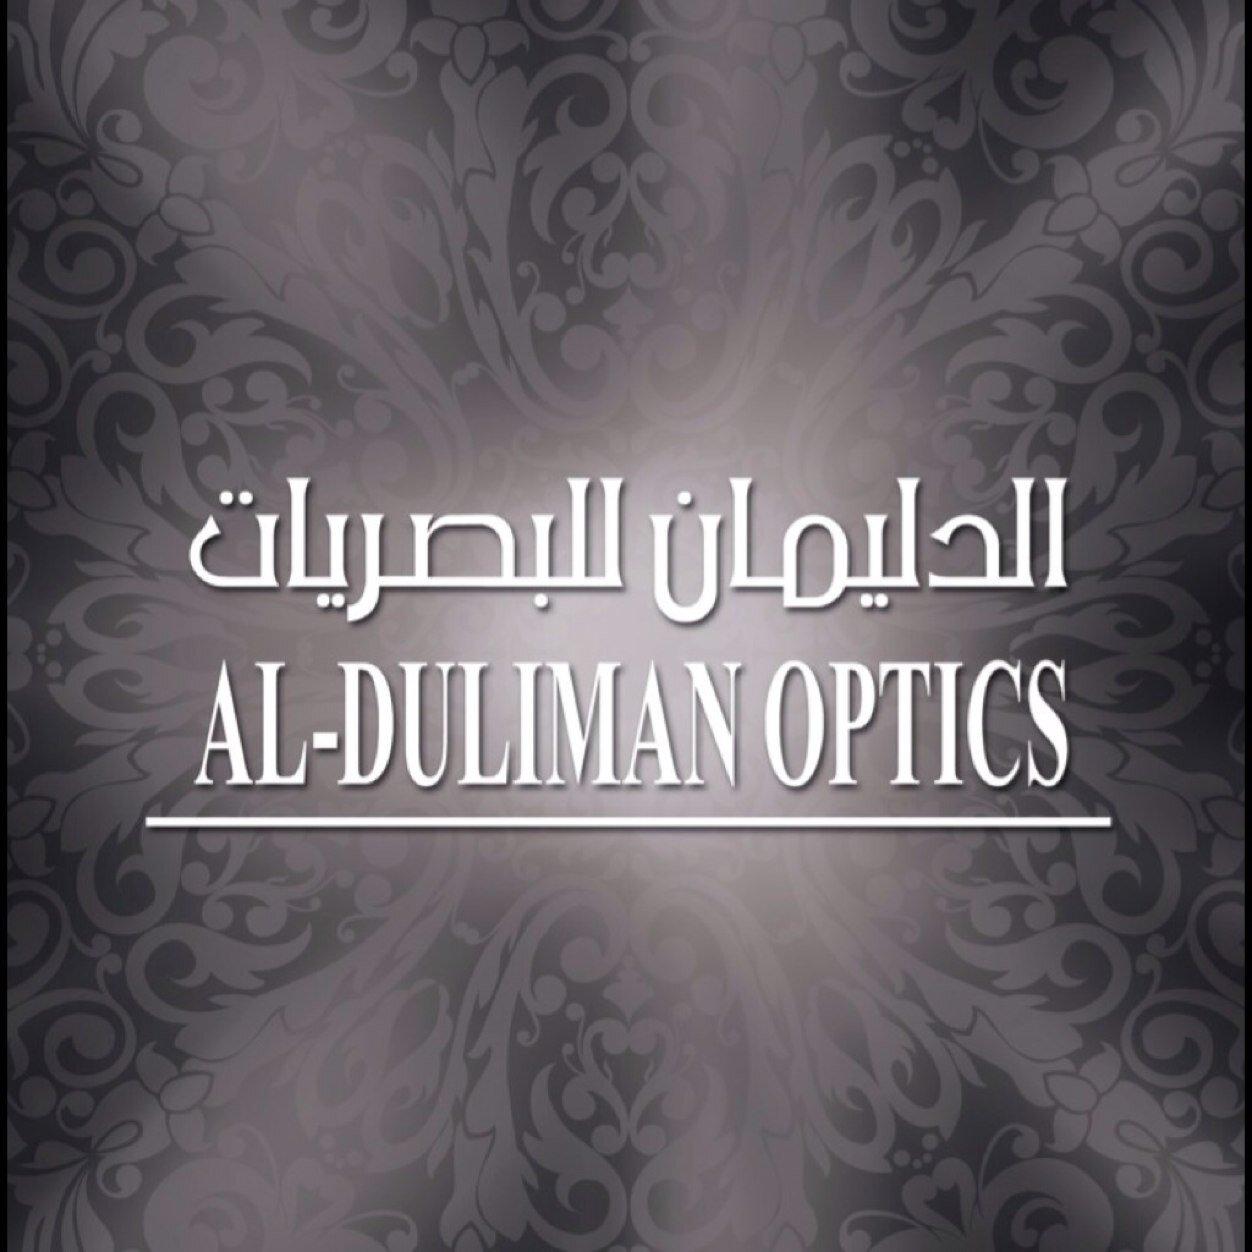 @aldulaimanoptic